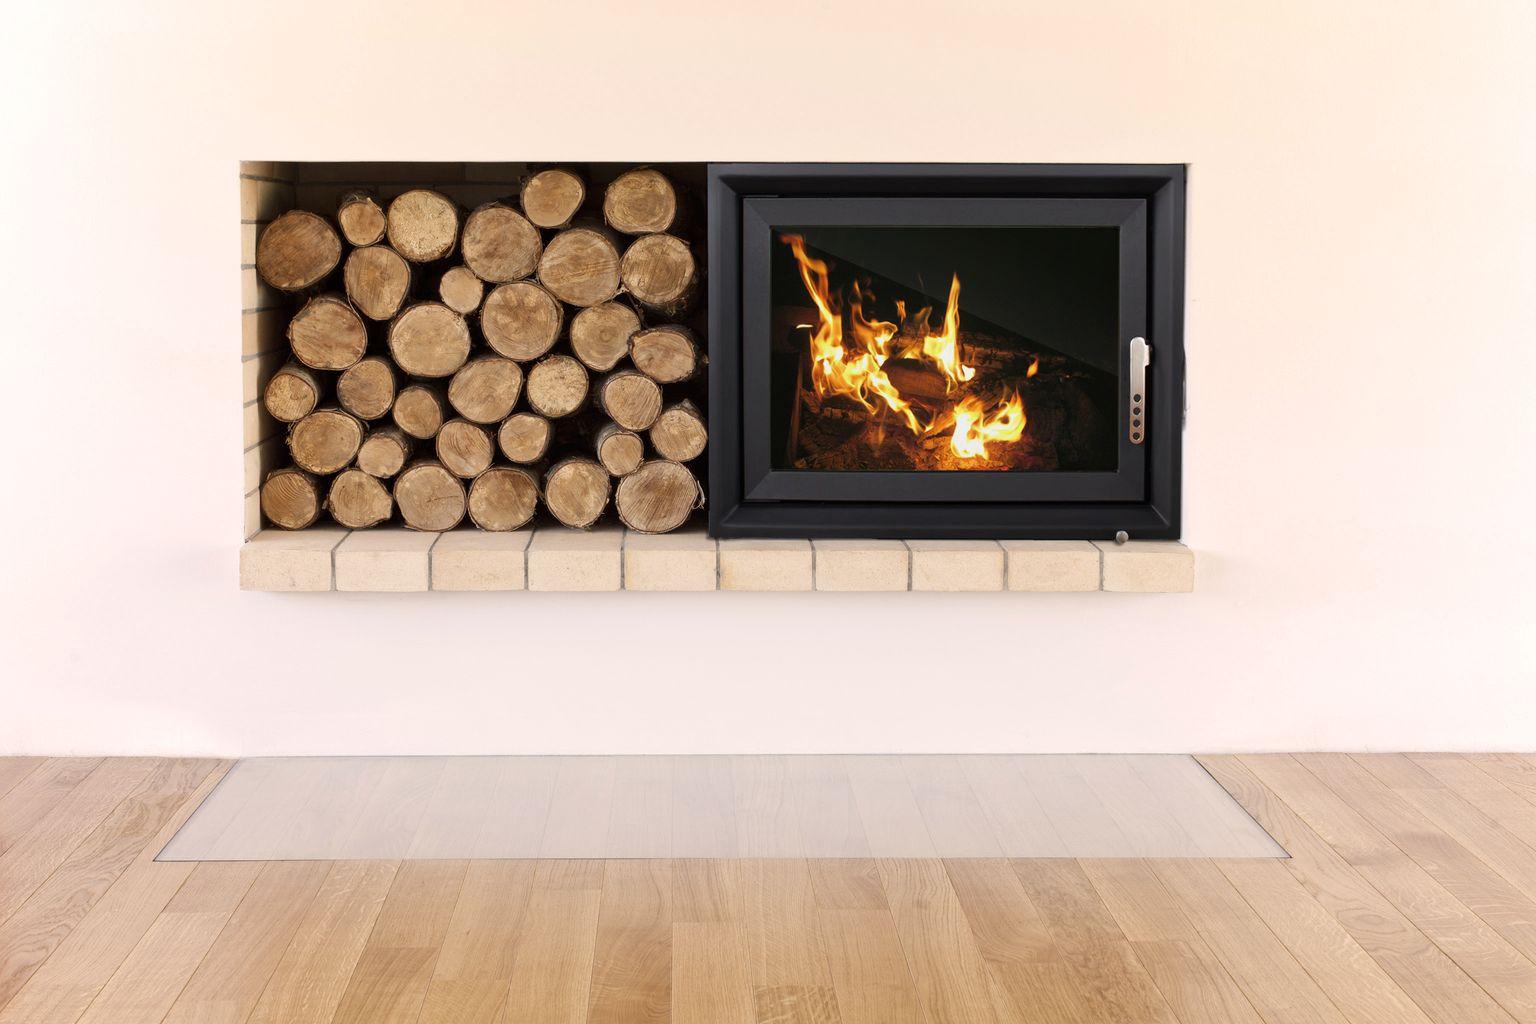 kamineinsatz wasserf hrend rohem aquatech egra 20 4 kw. Black Bedroom Furniture Sets. Home Design Ideas